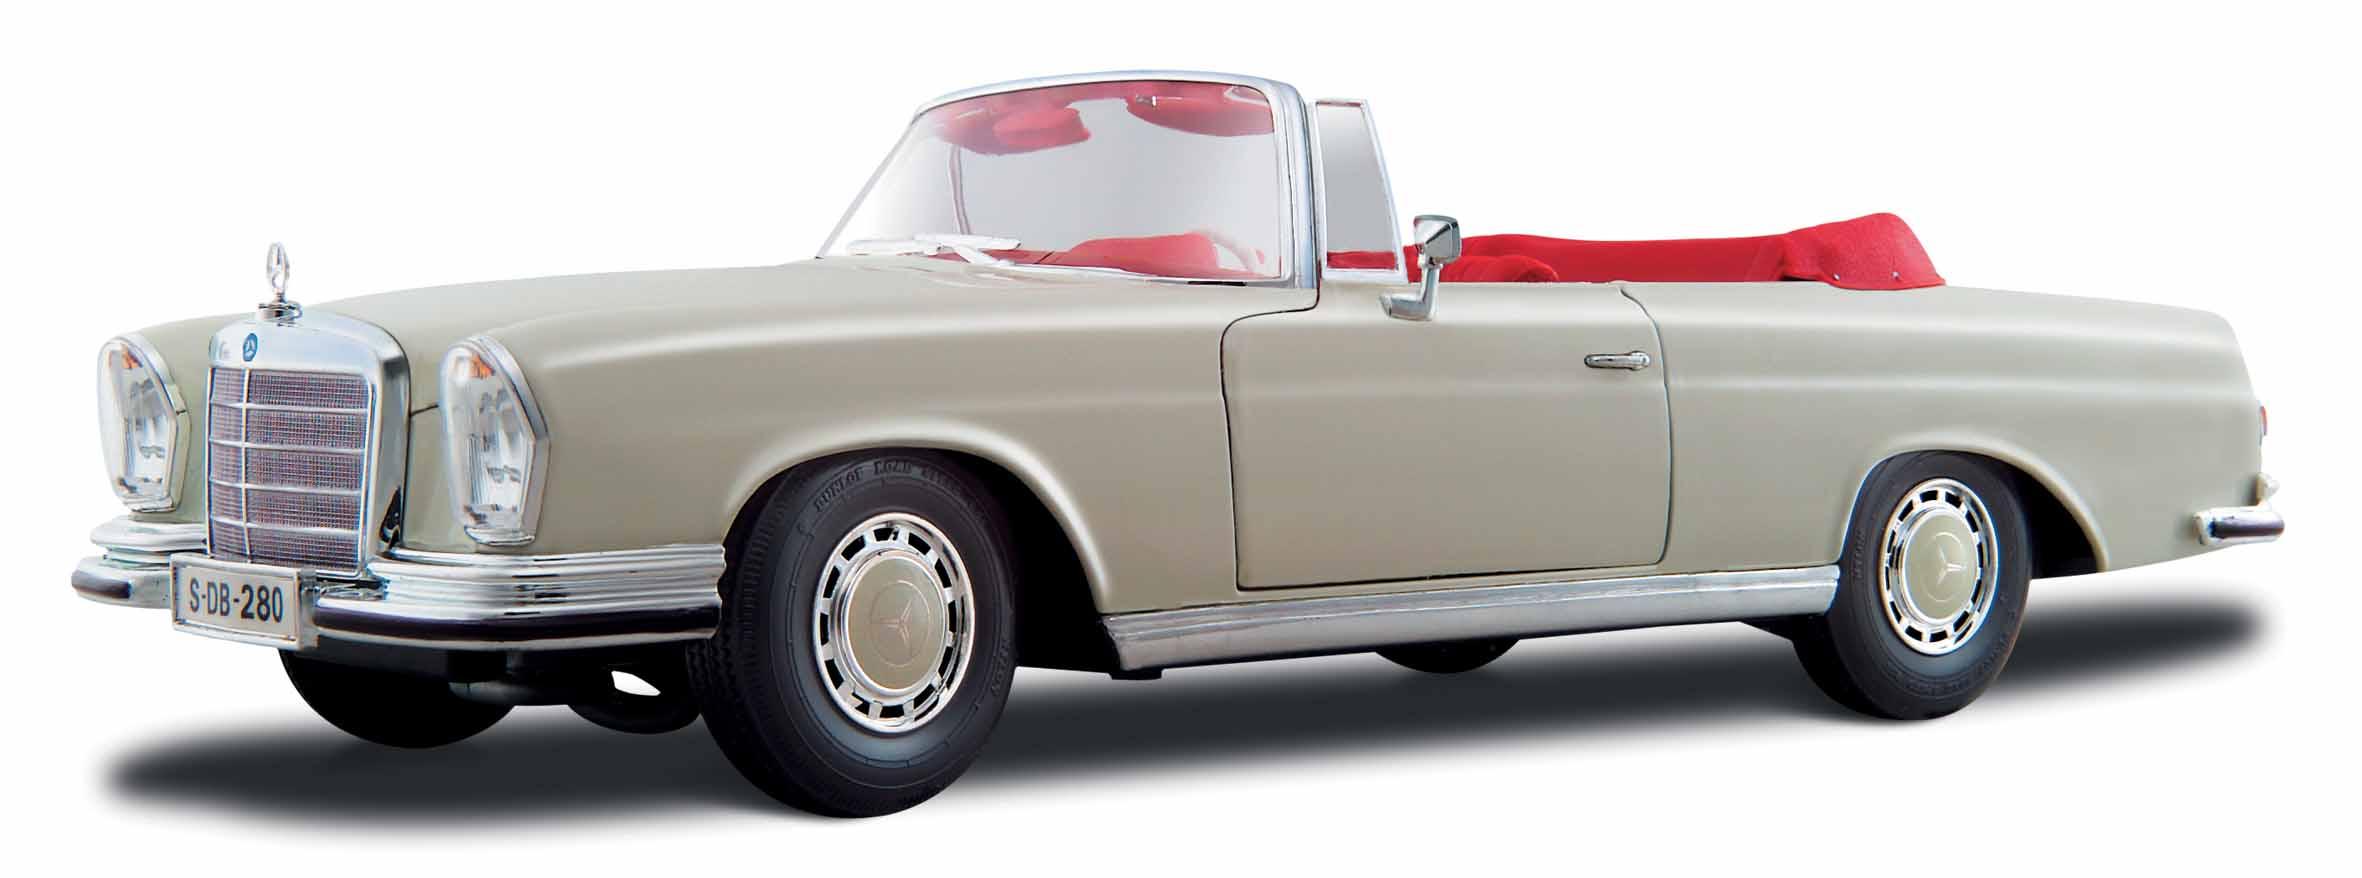 31811  1967 Mercedes-Benz 280SE, crème, Maisto